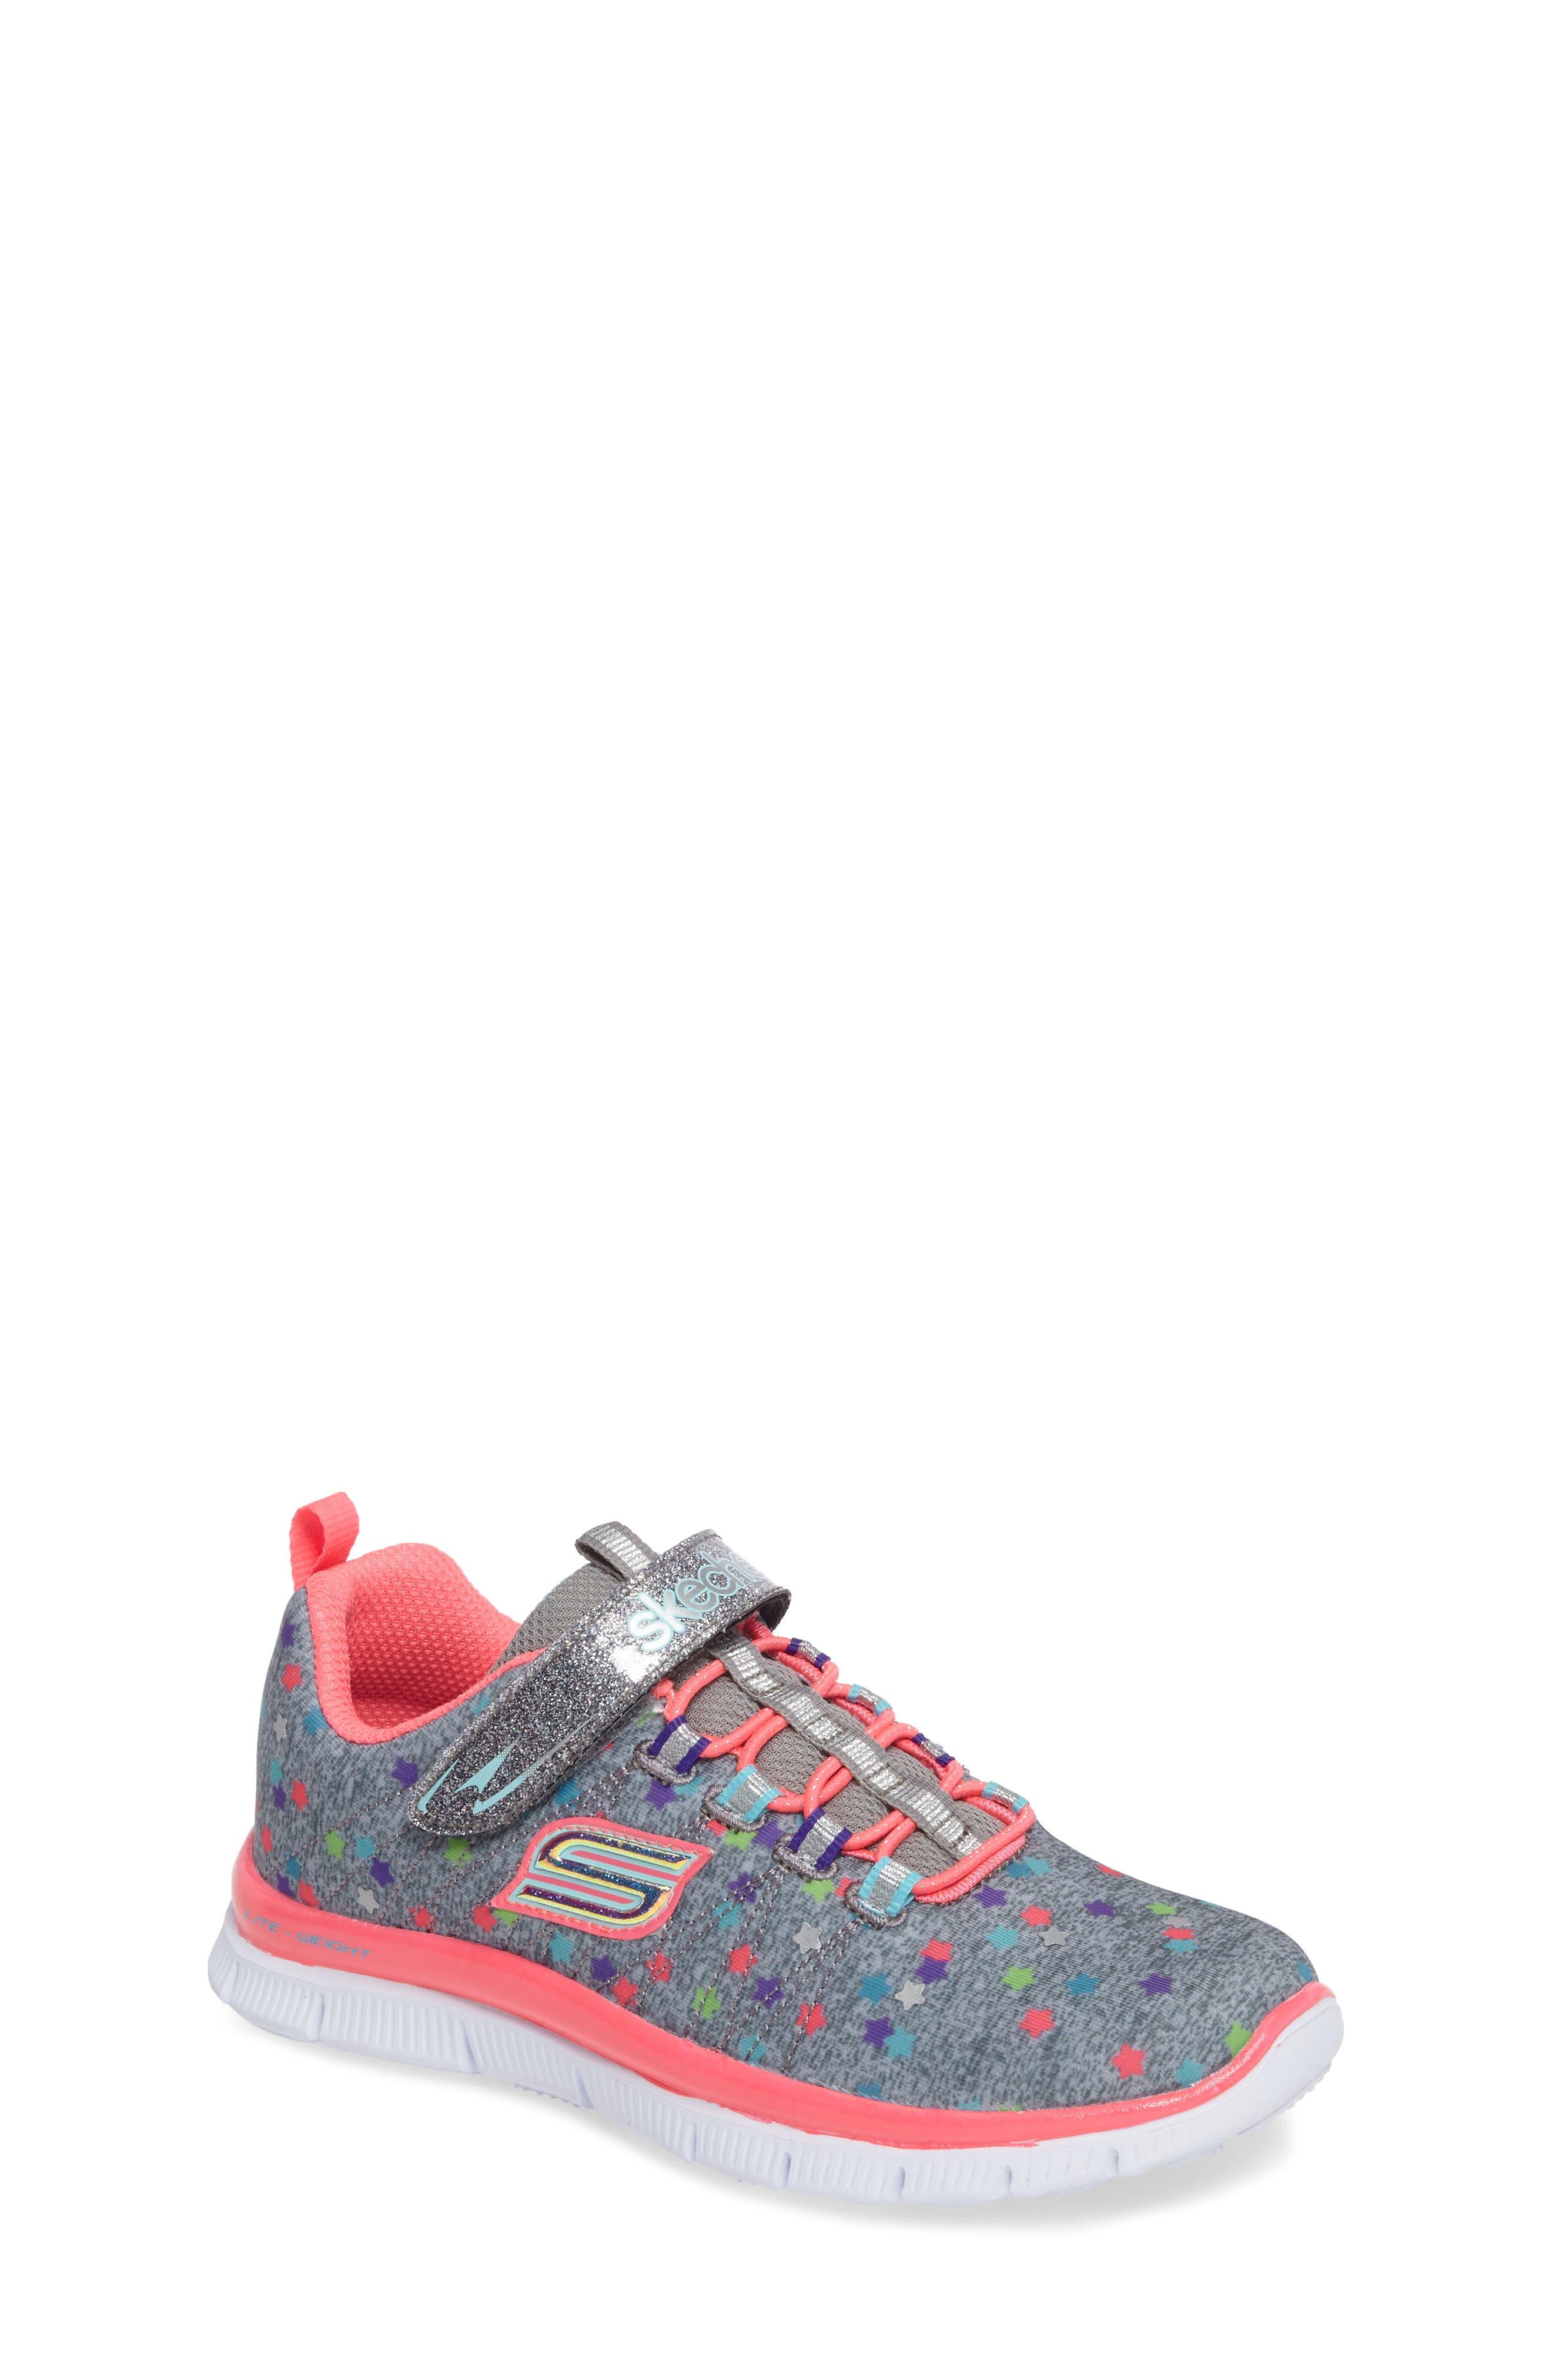 SKECHERS Skech Appeal Star Spirit Sneaker